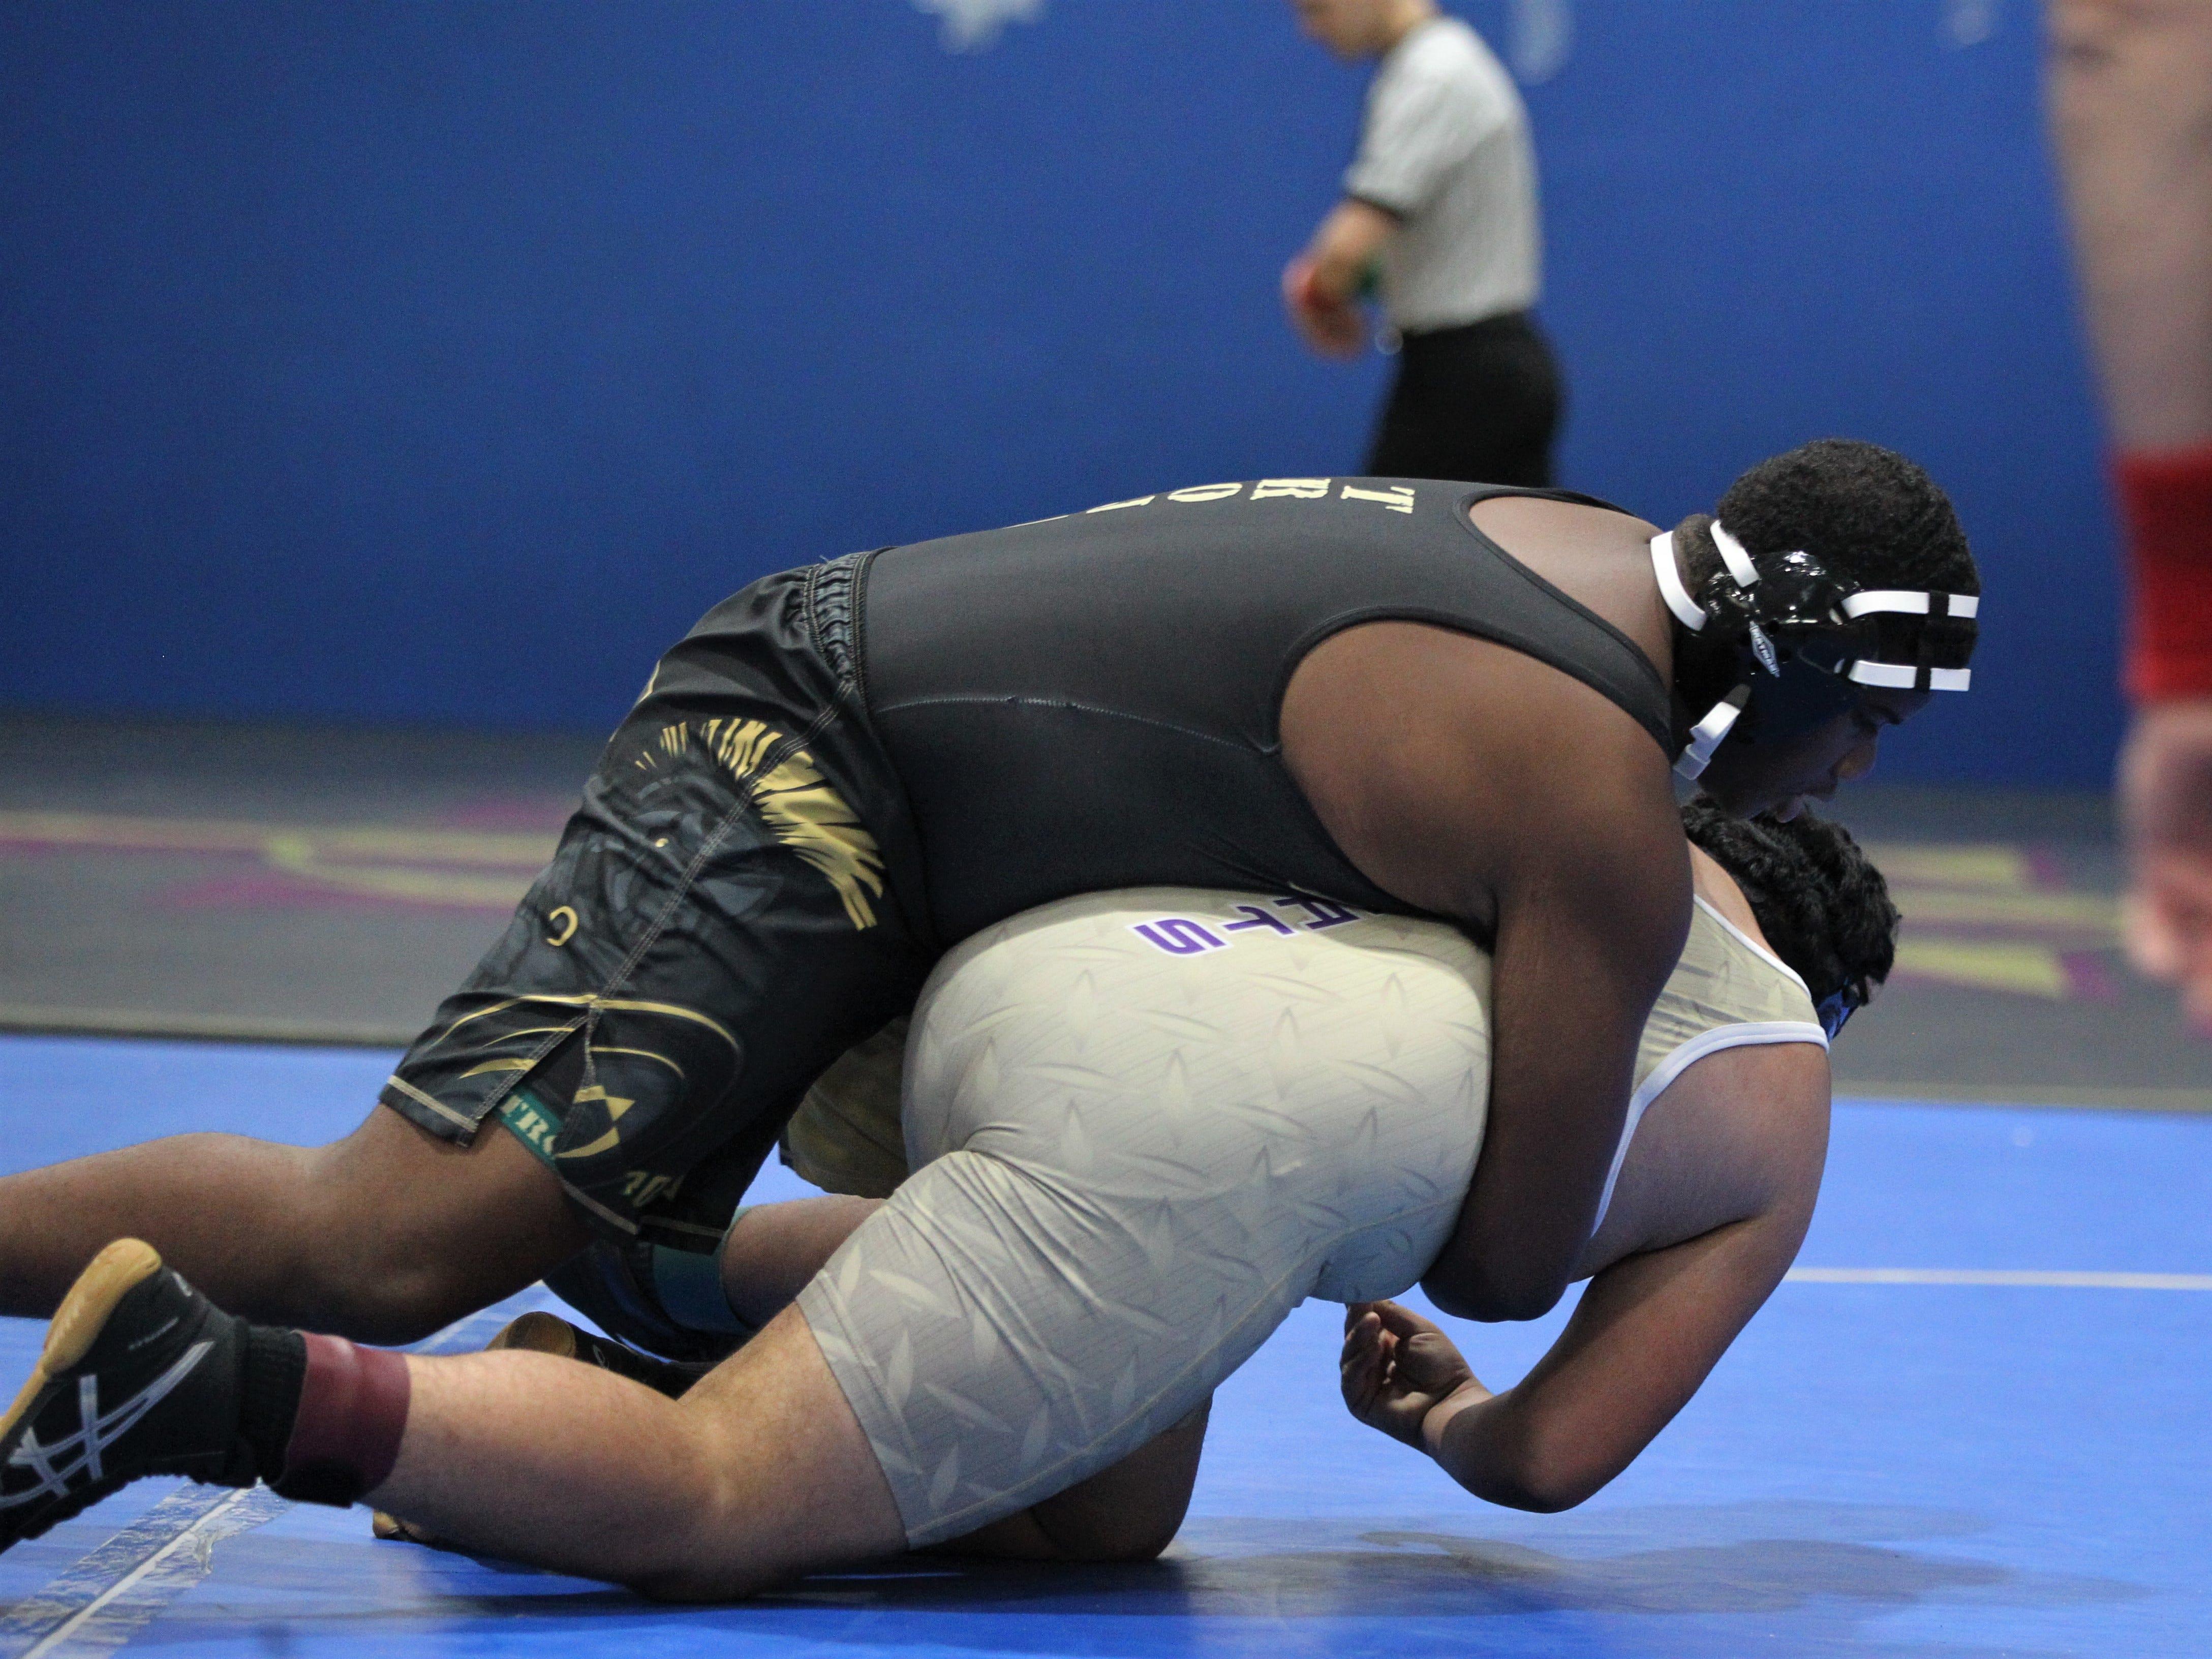 Cam Brown Seminole Classic wrestling tournament at Florida High on Dec. 7-8, 2018.